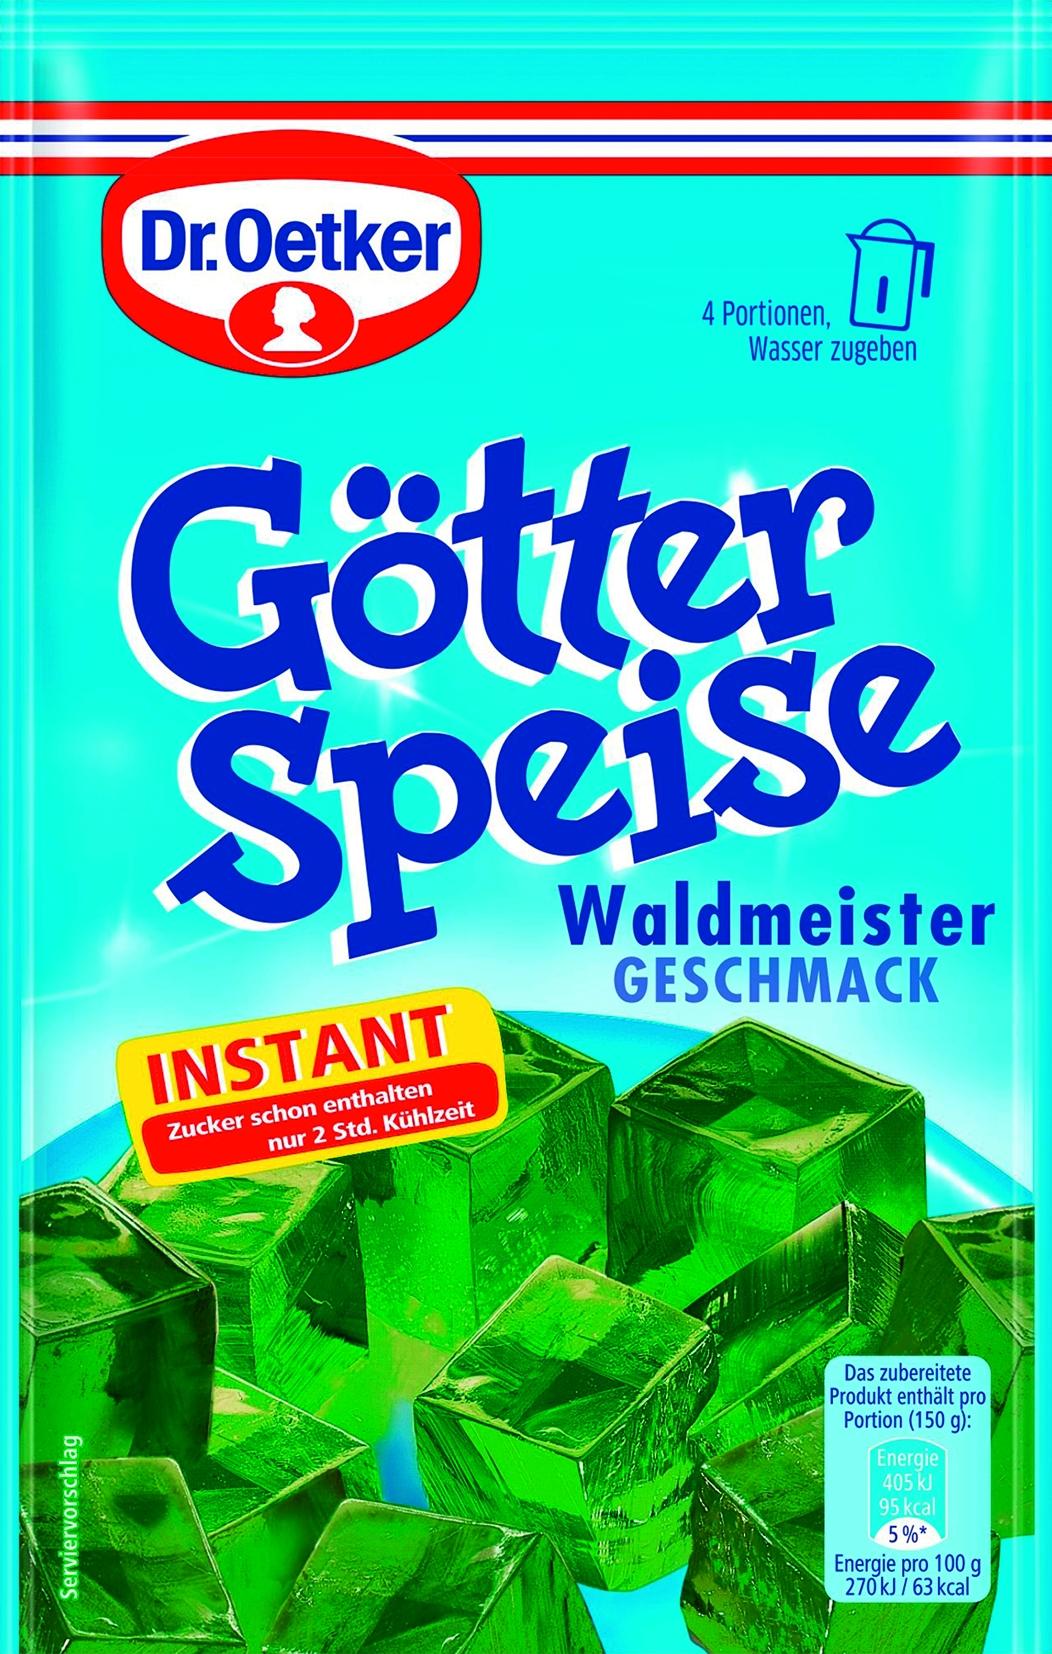 Instant Goetterspeise Waldmeister